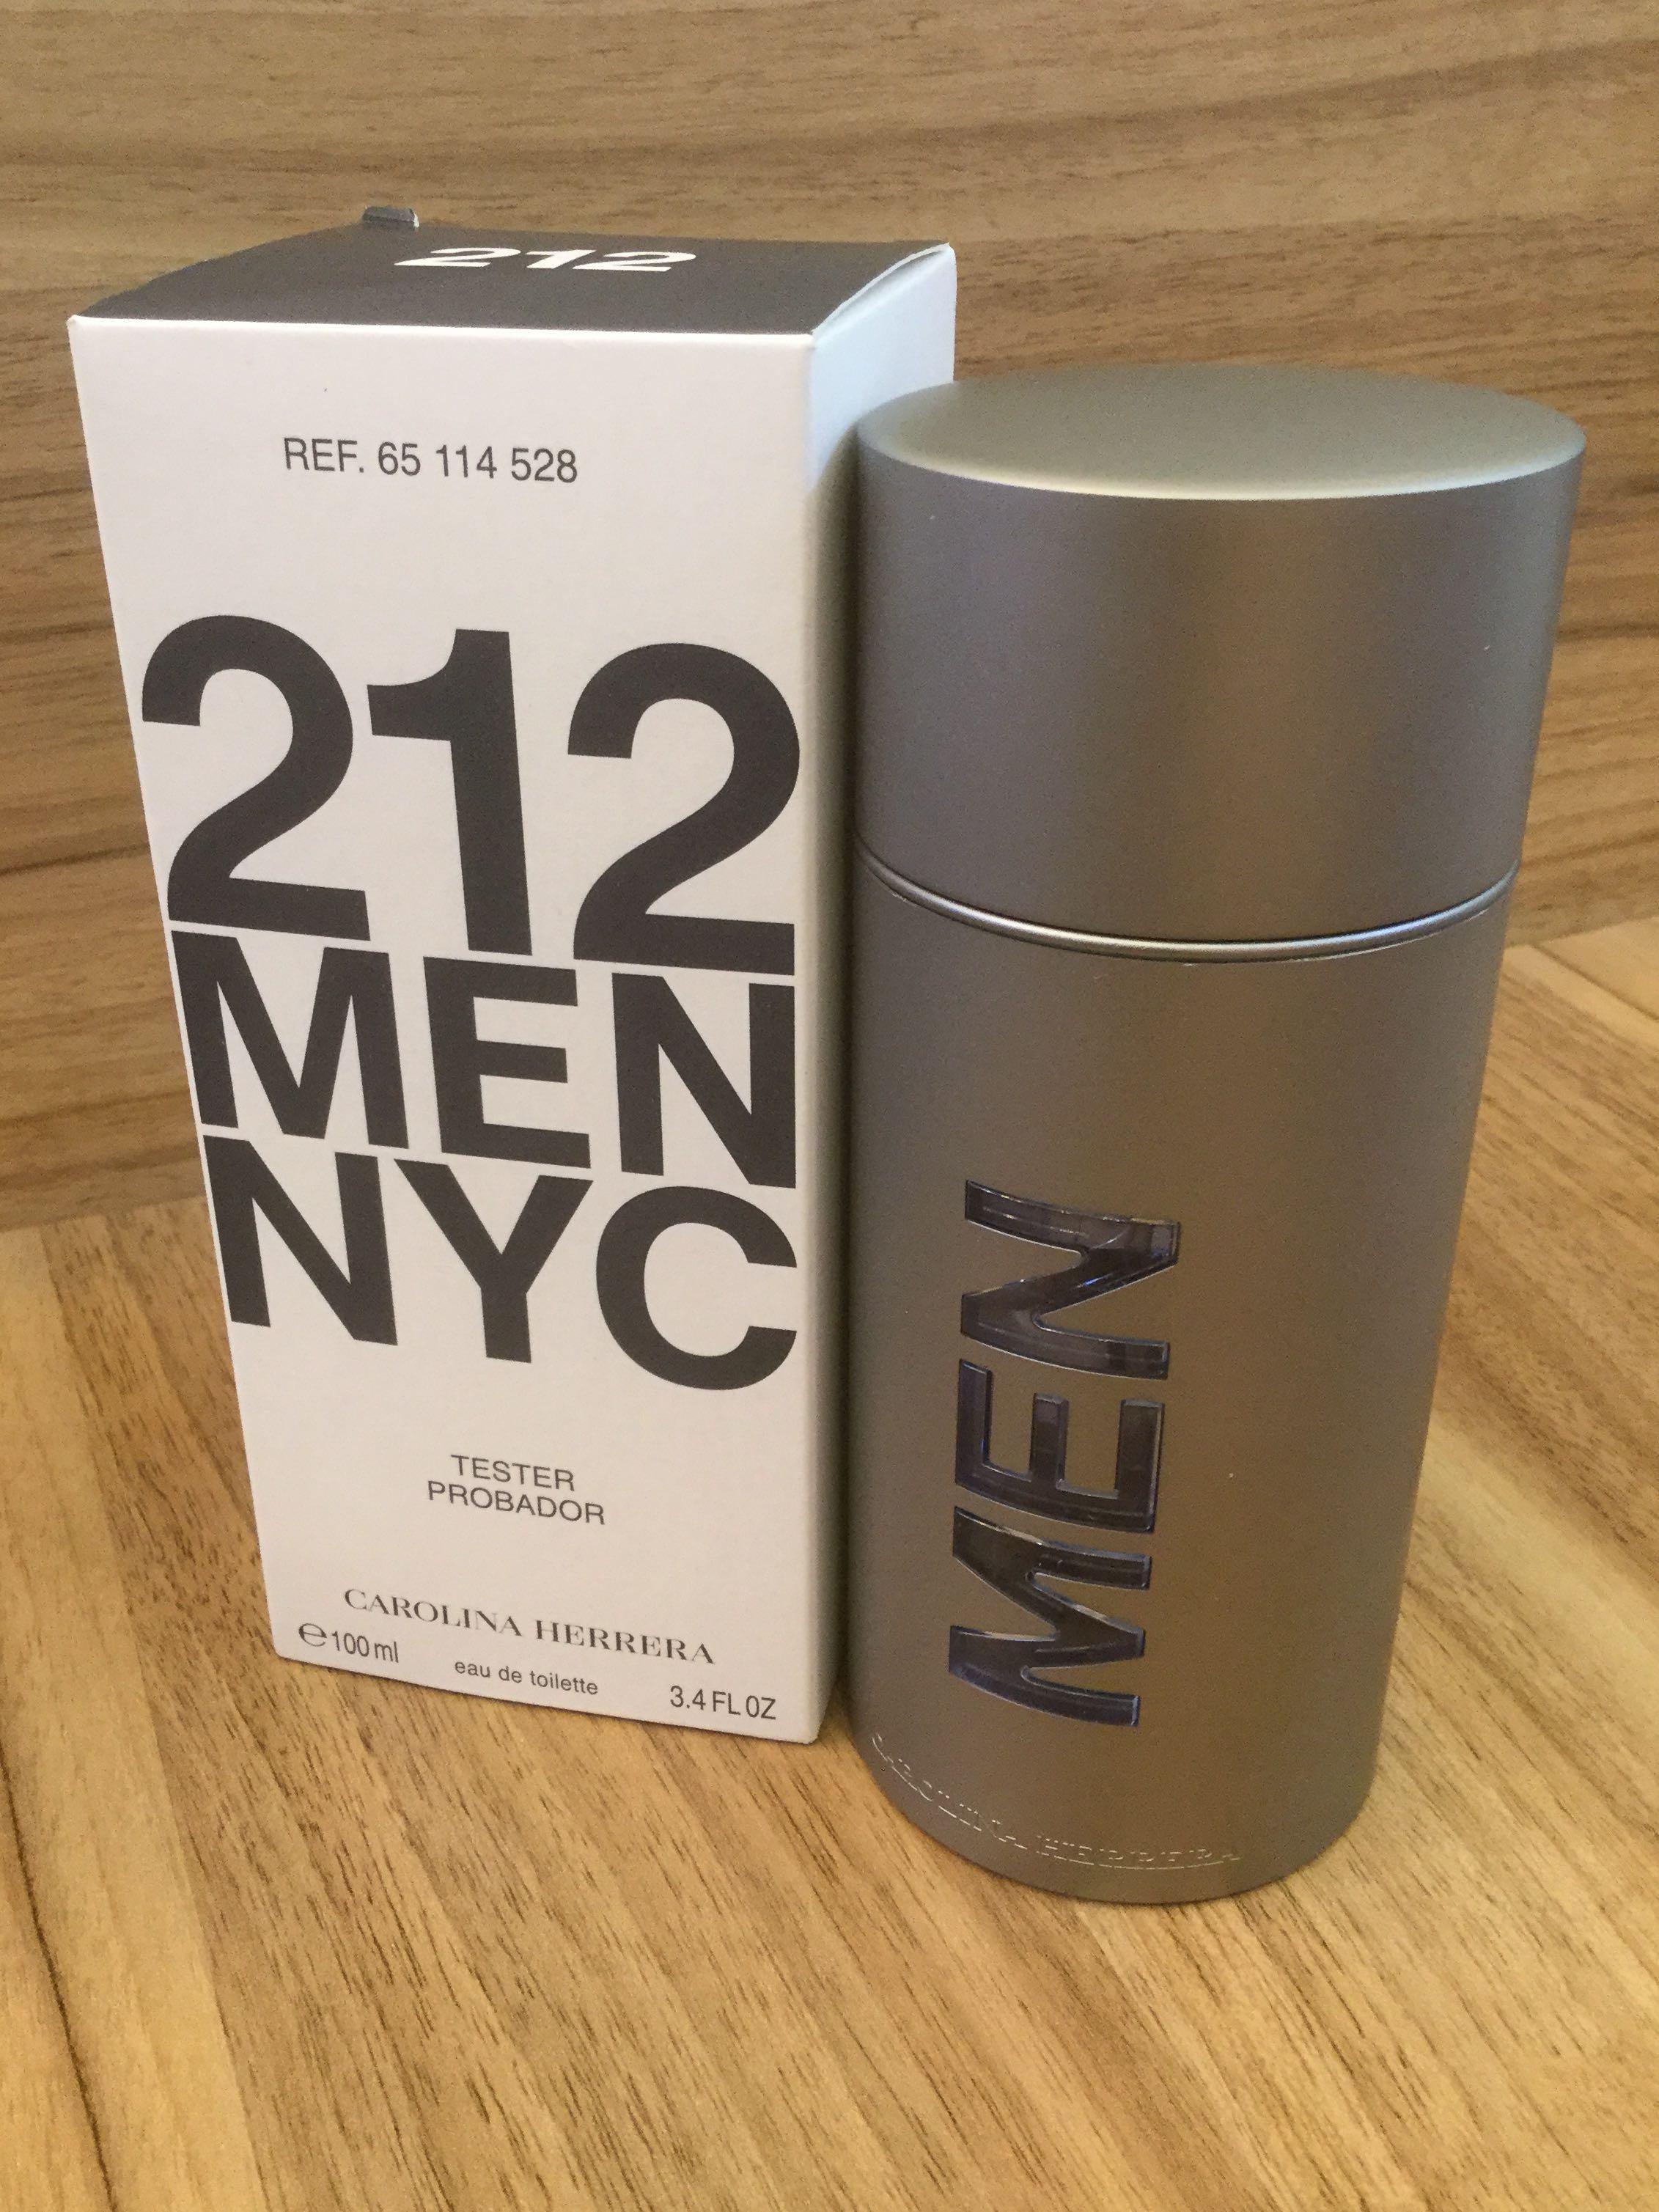 Carolina Herrera 212 Men NYC (reserv)